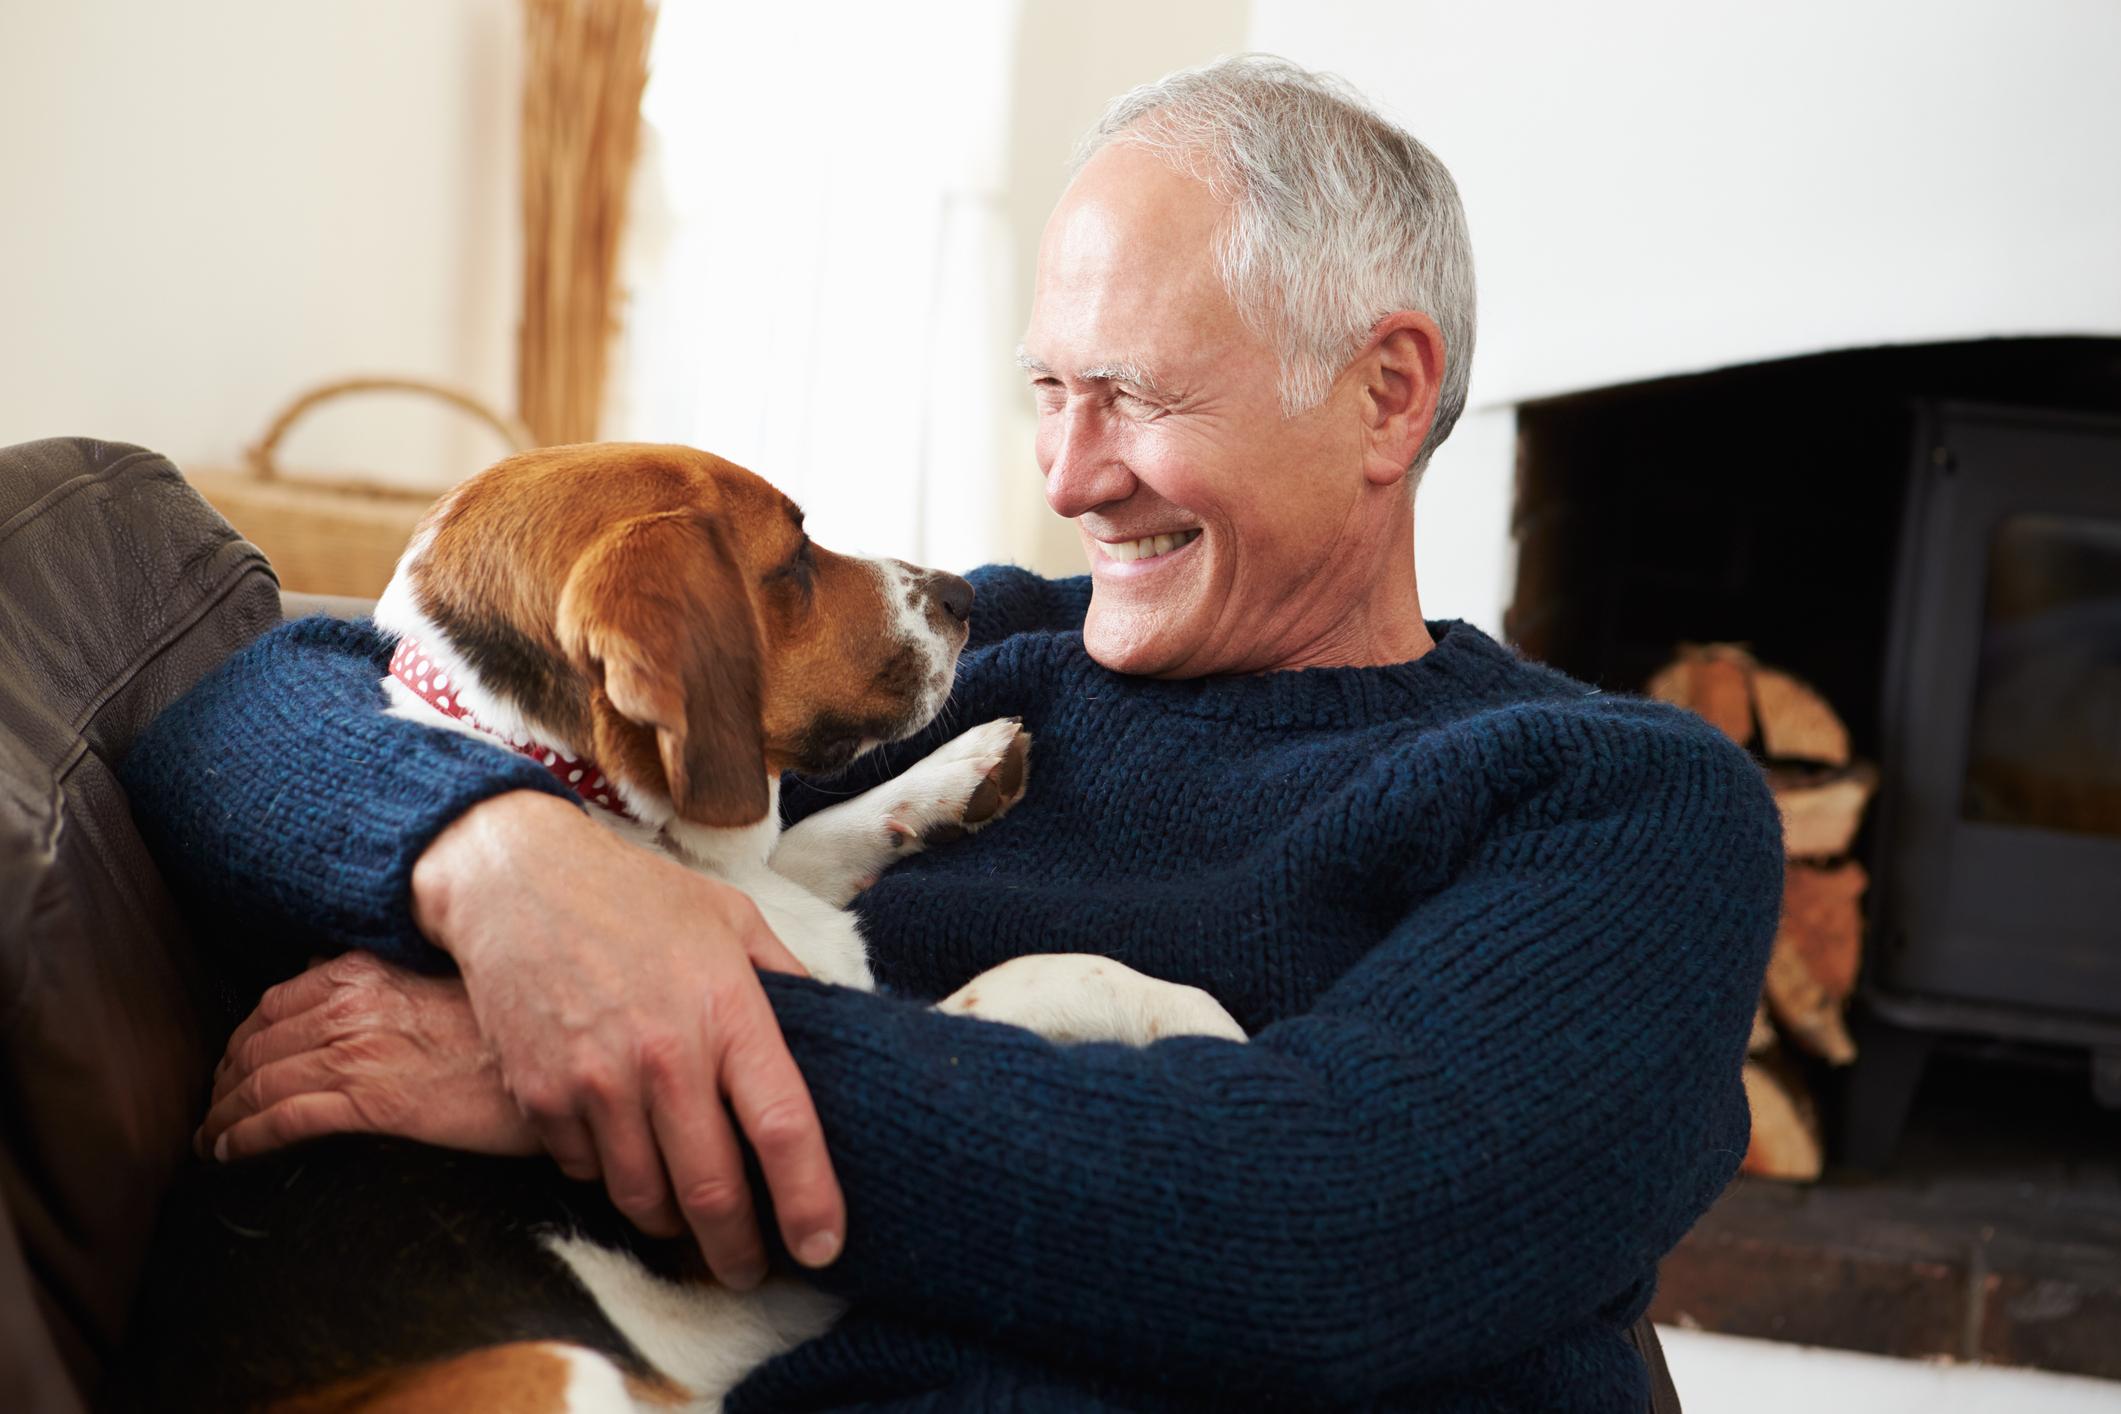 Smiling senior man holding dog.